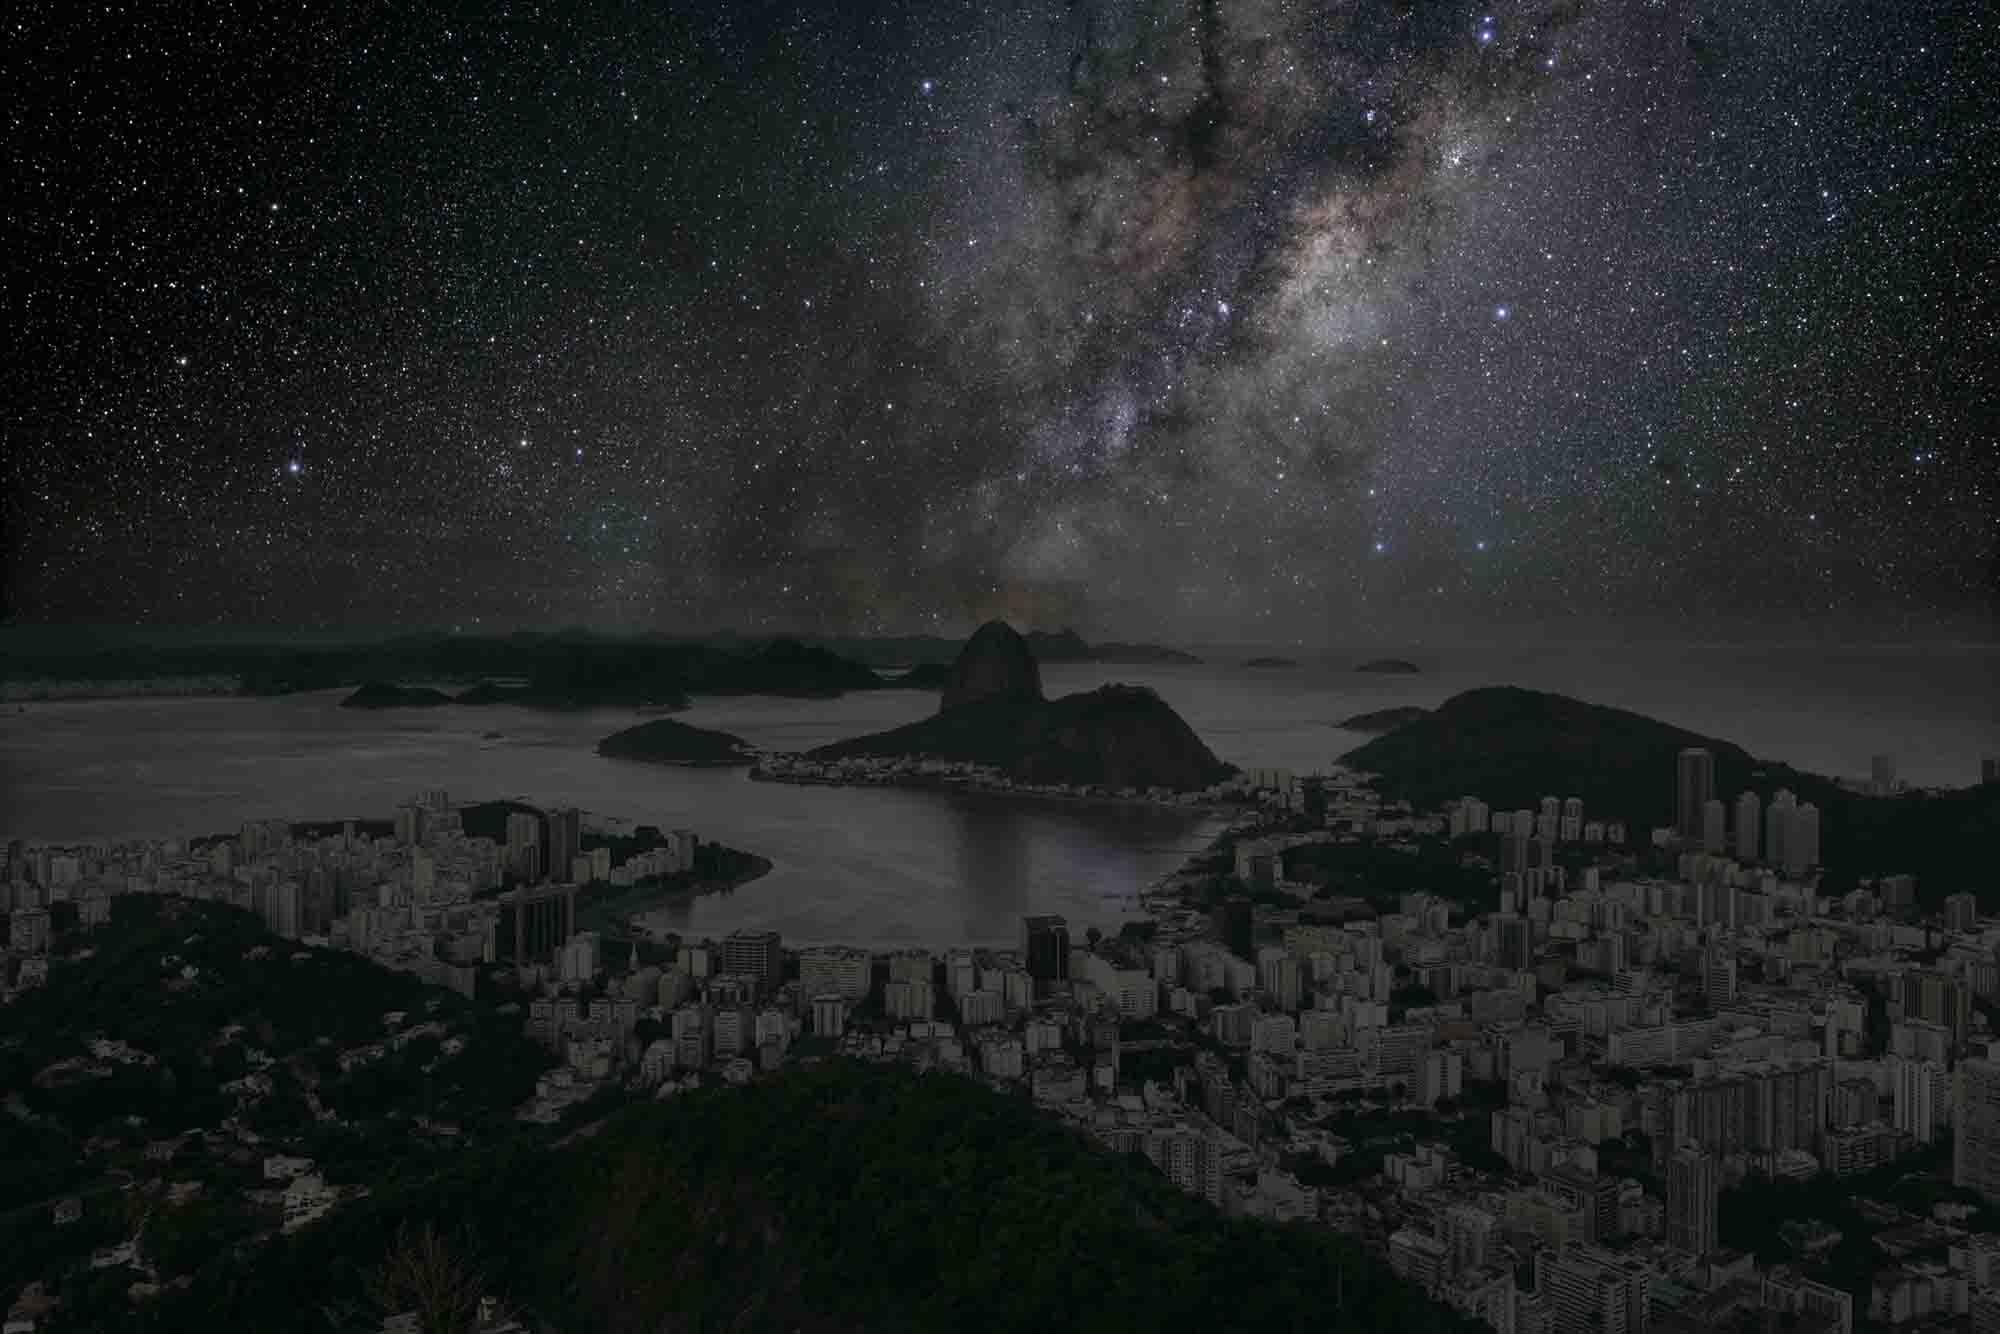 Rio de Janeiro 22° 56' 42'' S 2011-06-04 lst 12:34<br/>Darkened Cities - Villes éteintes